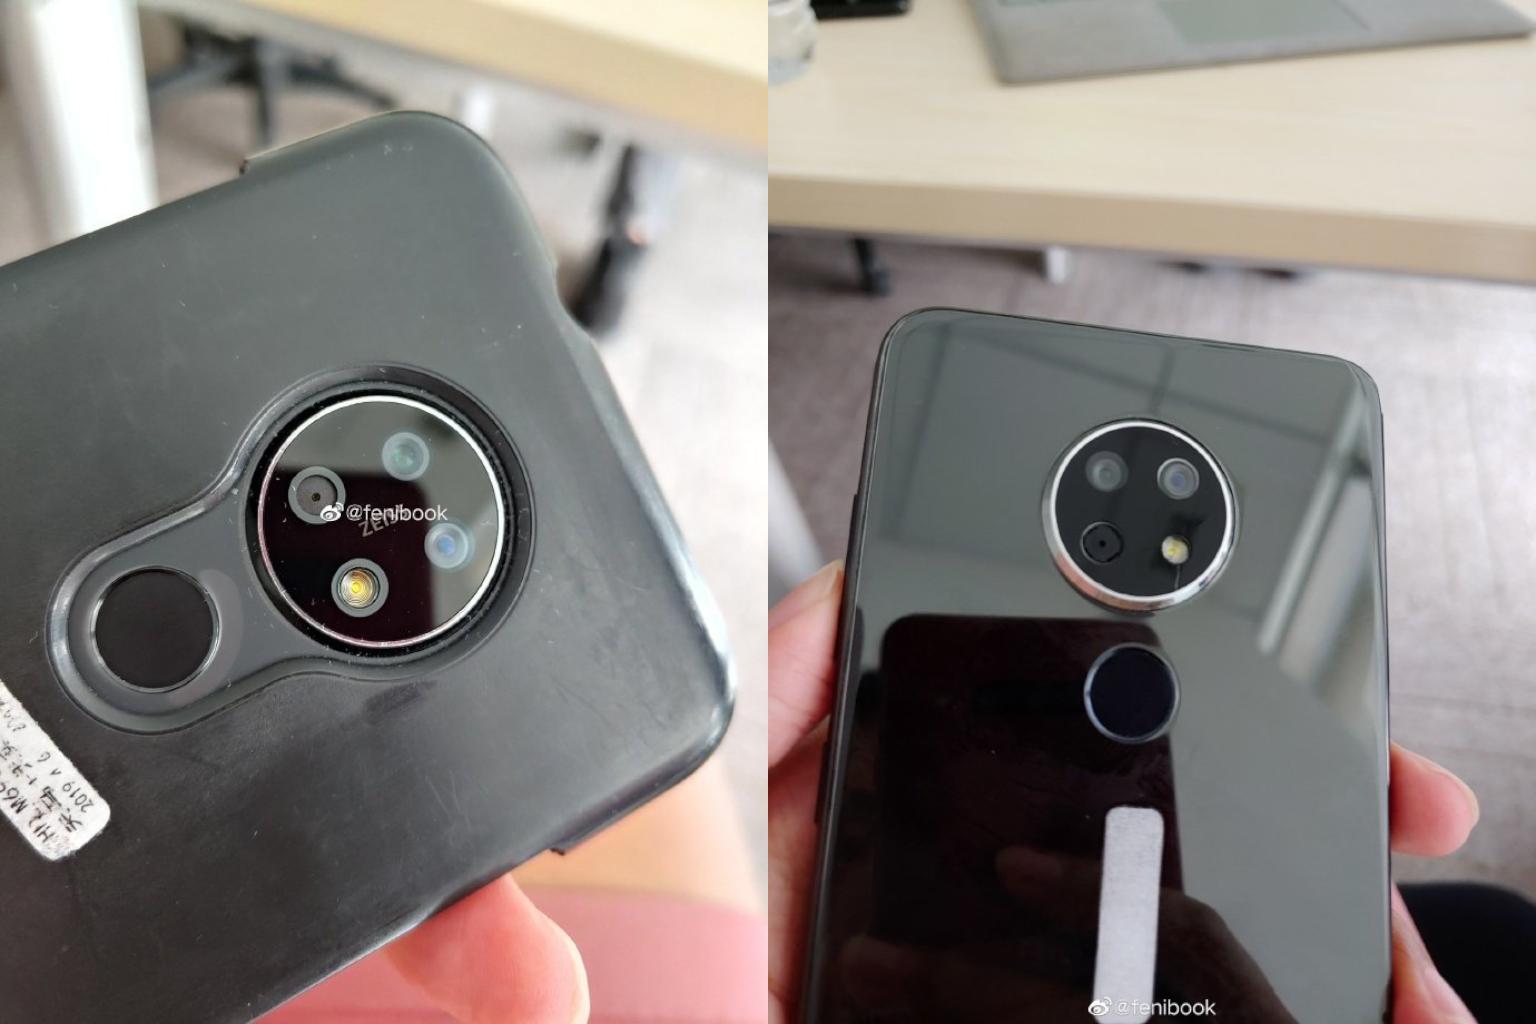 nokia device with 48MP camera